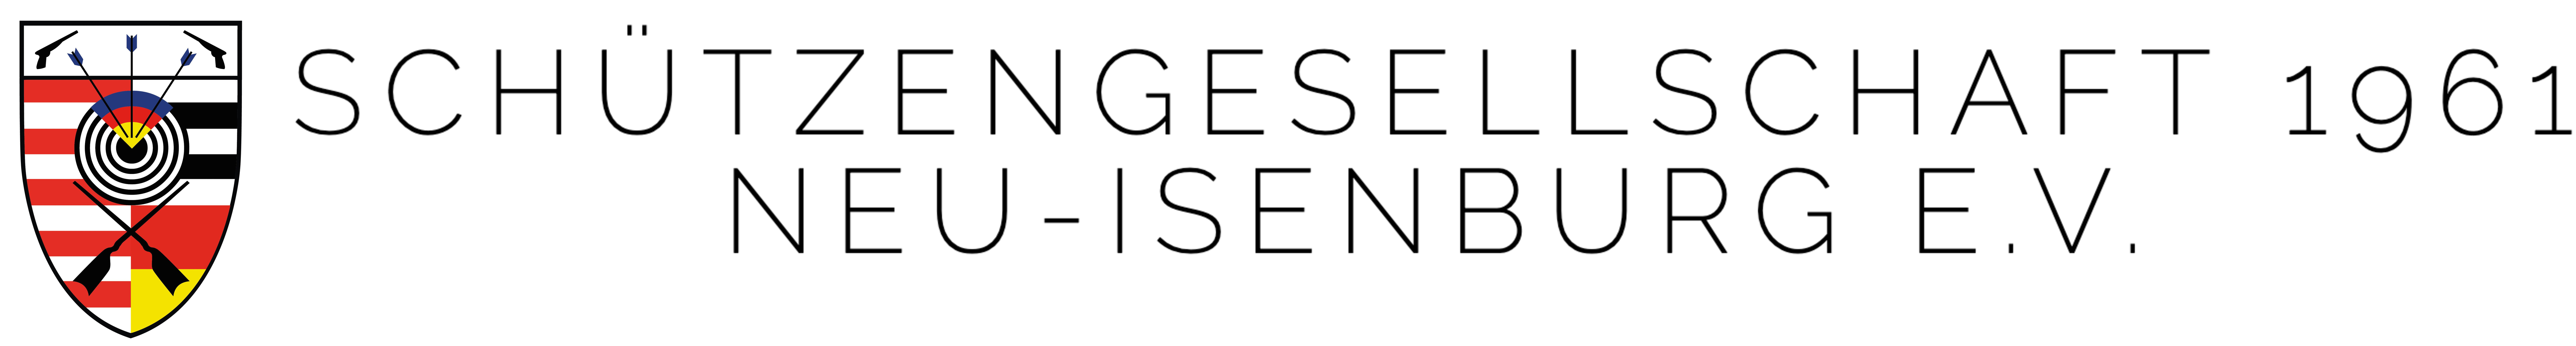 Schützengesellschaft 1961 Neu-Isenburg e.V.